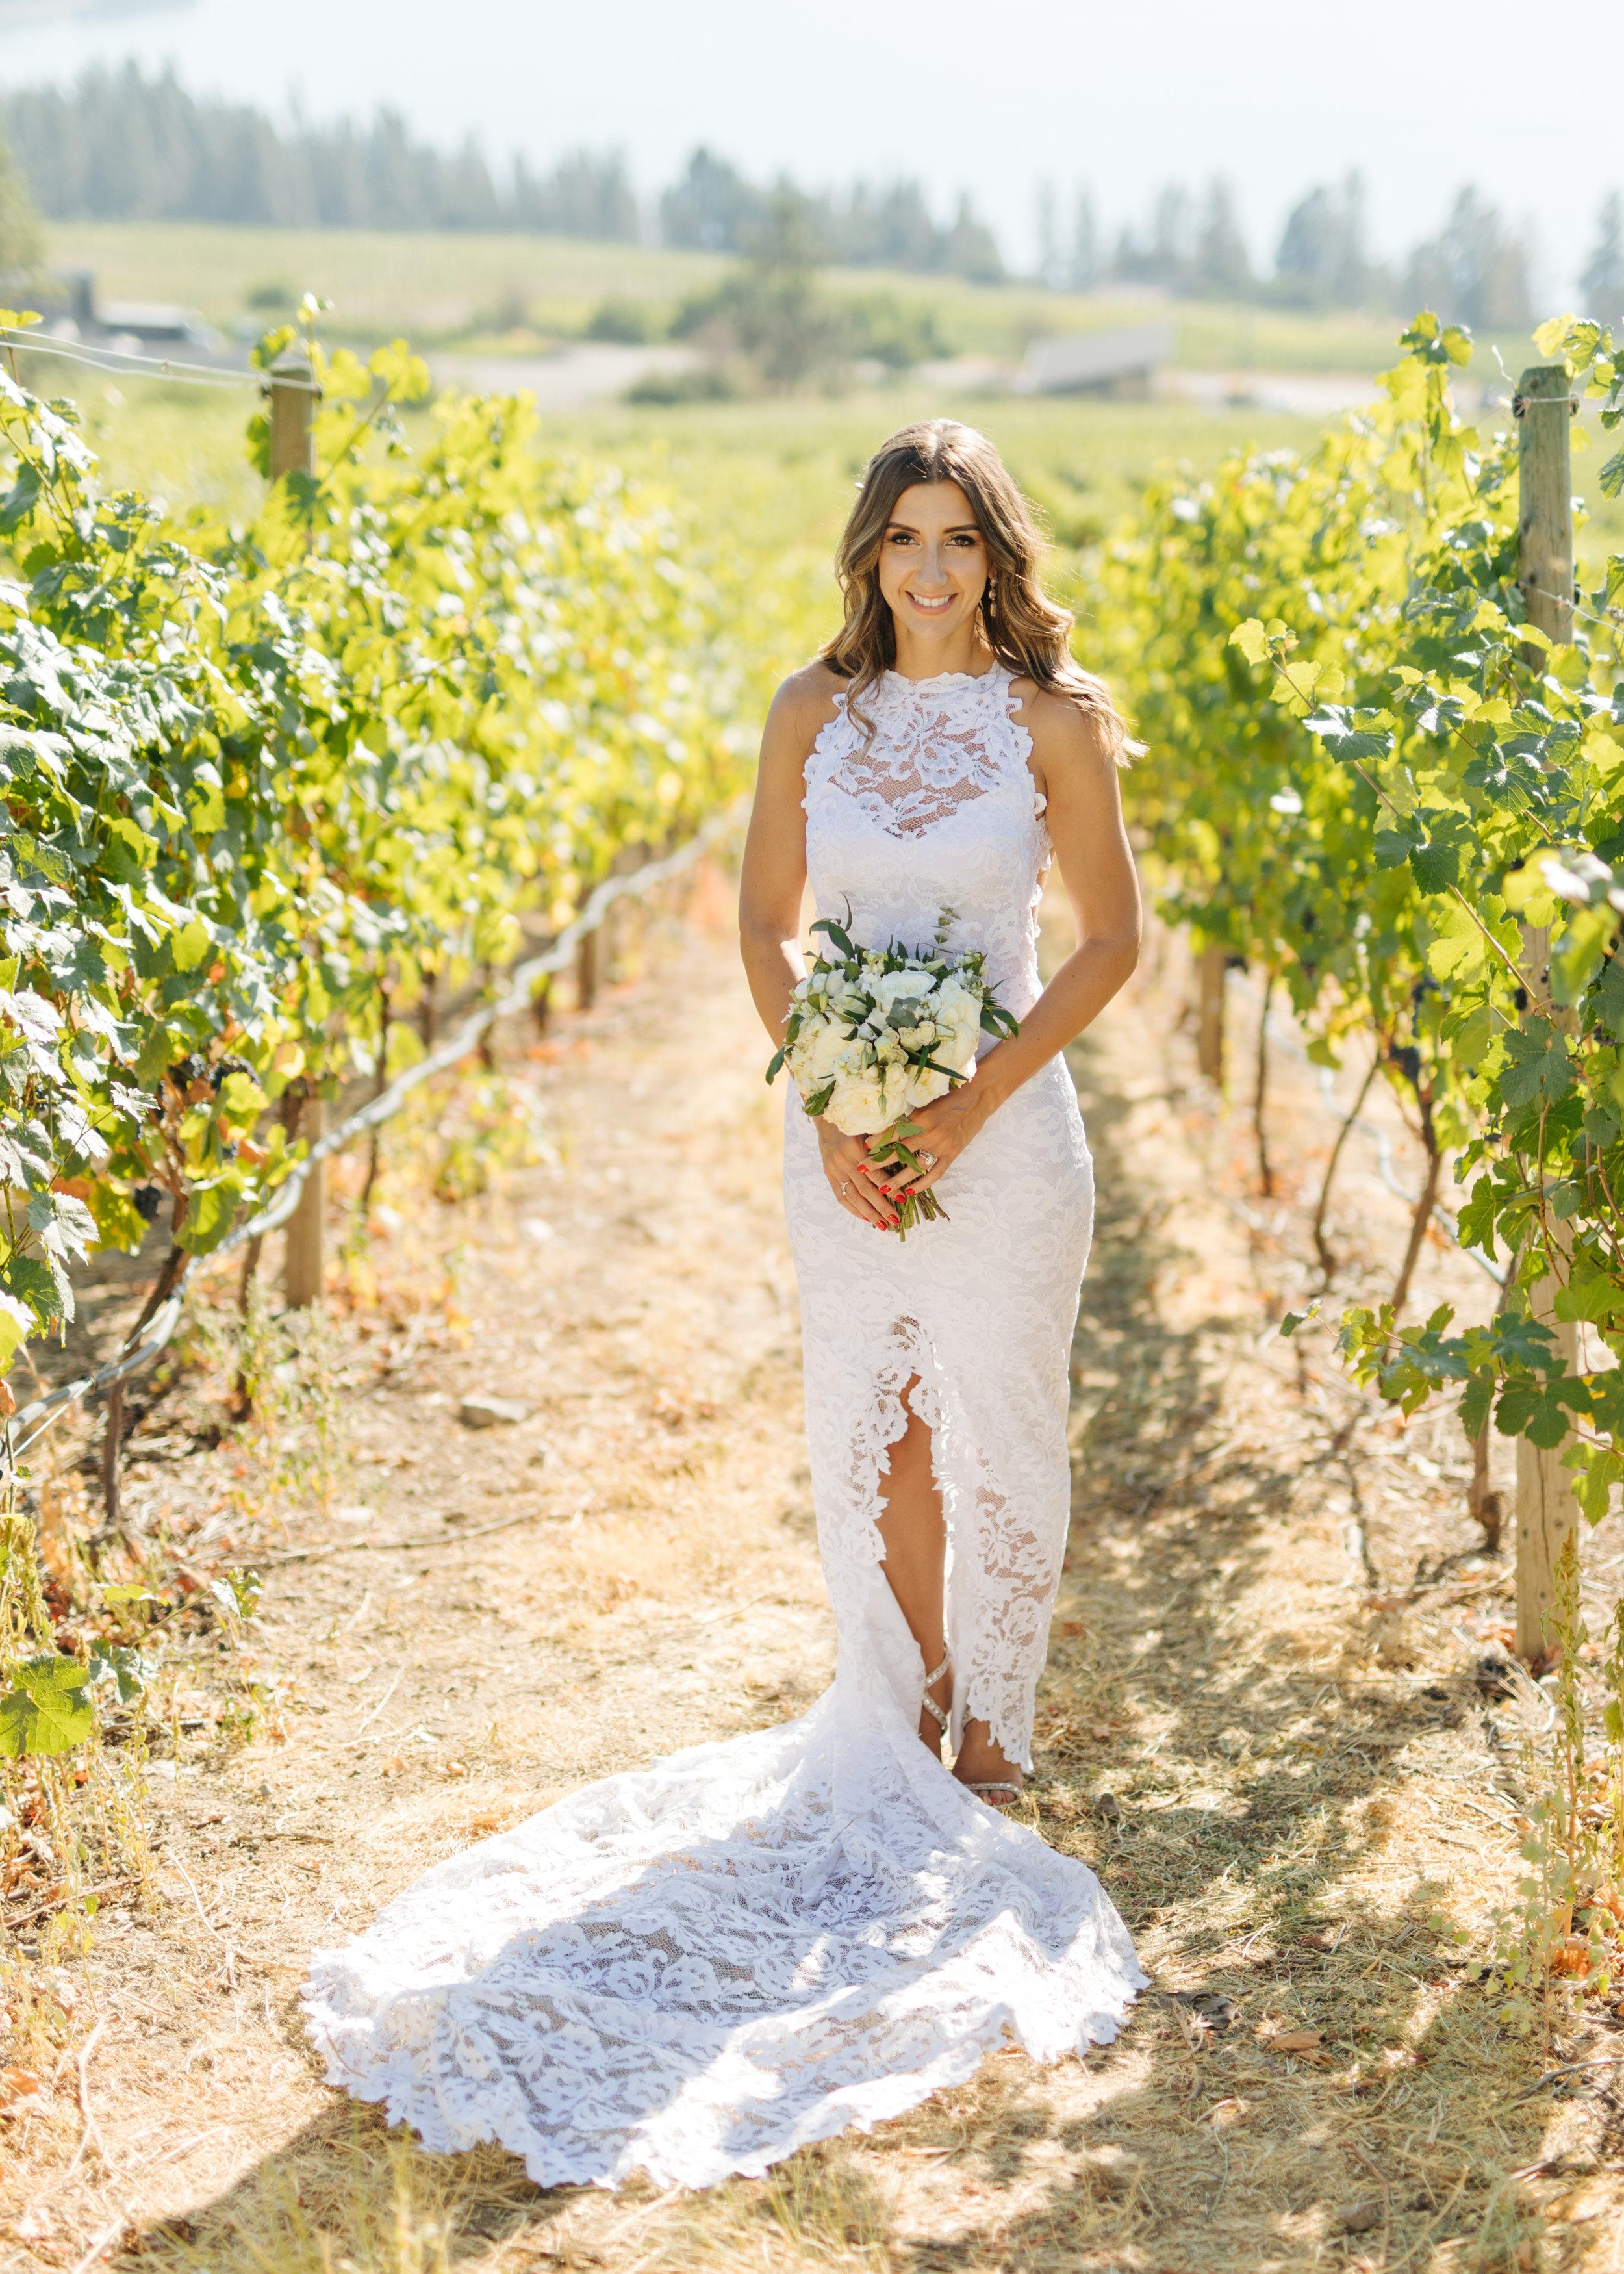 herastudios_wedding_dubravka_ognjen_hera_selects-75.jpg